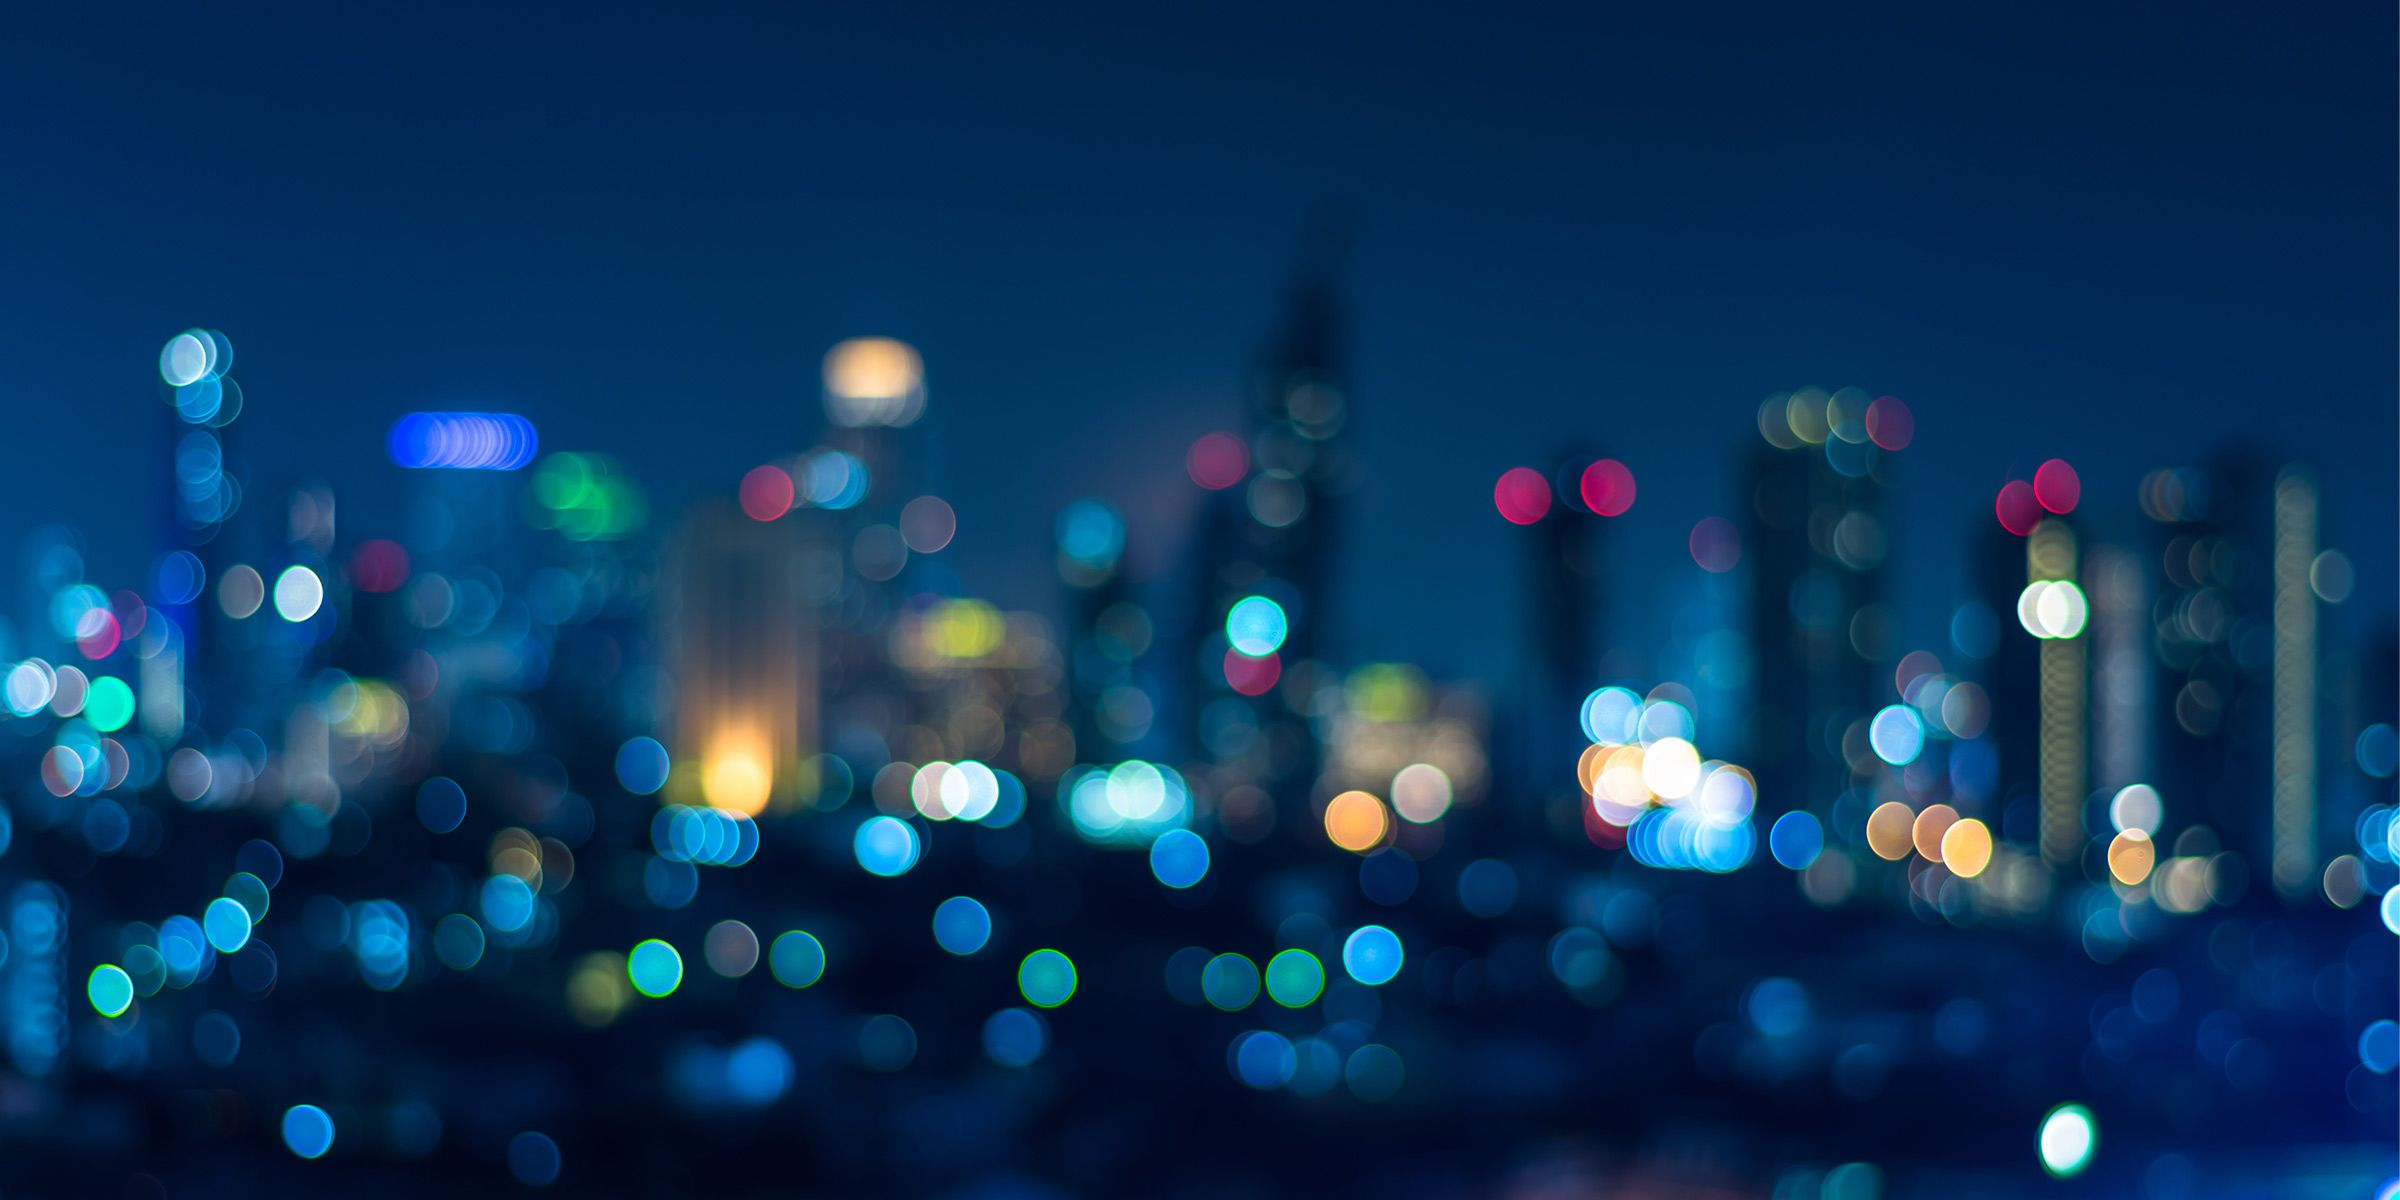 Blurred_City_BG